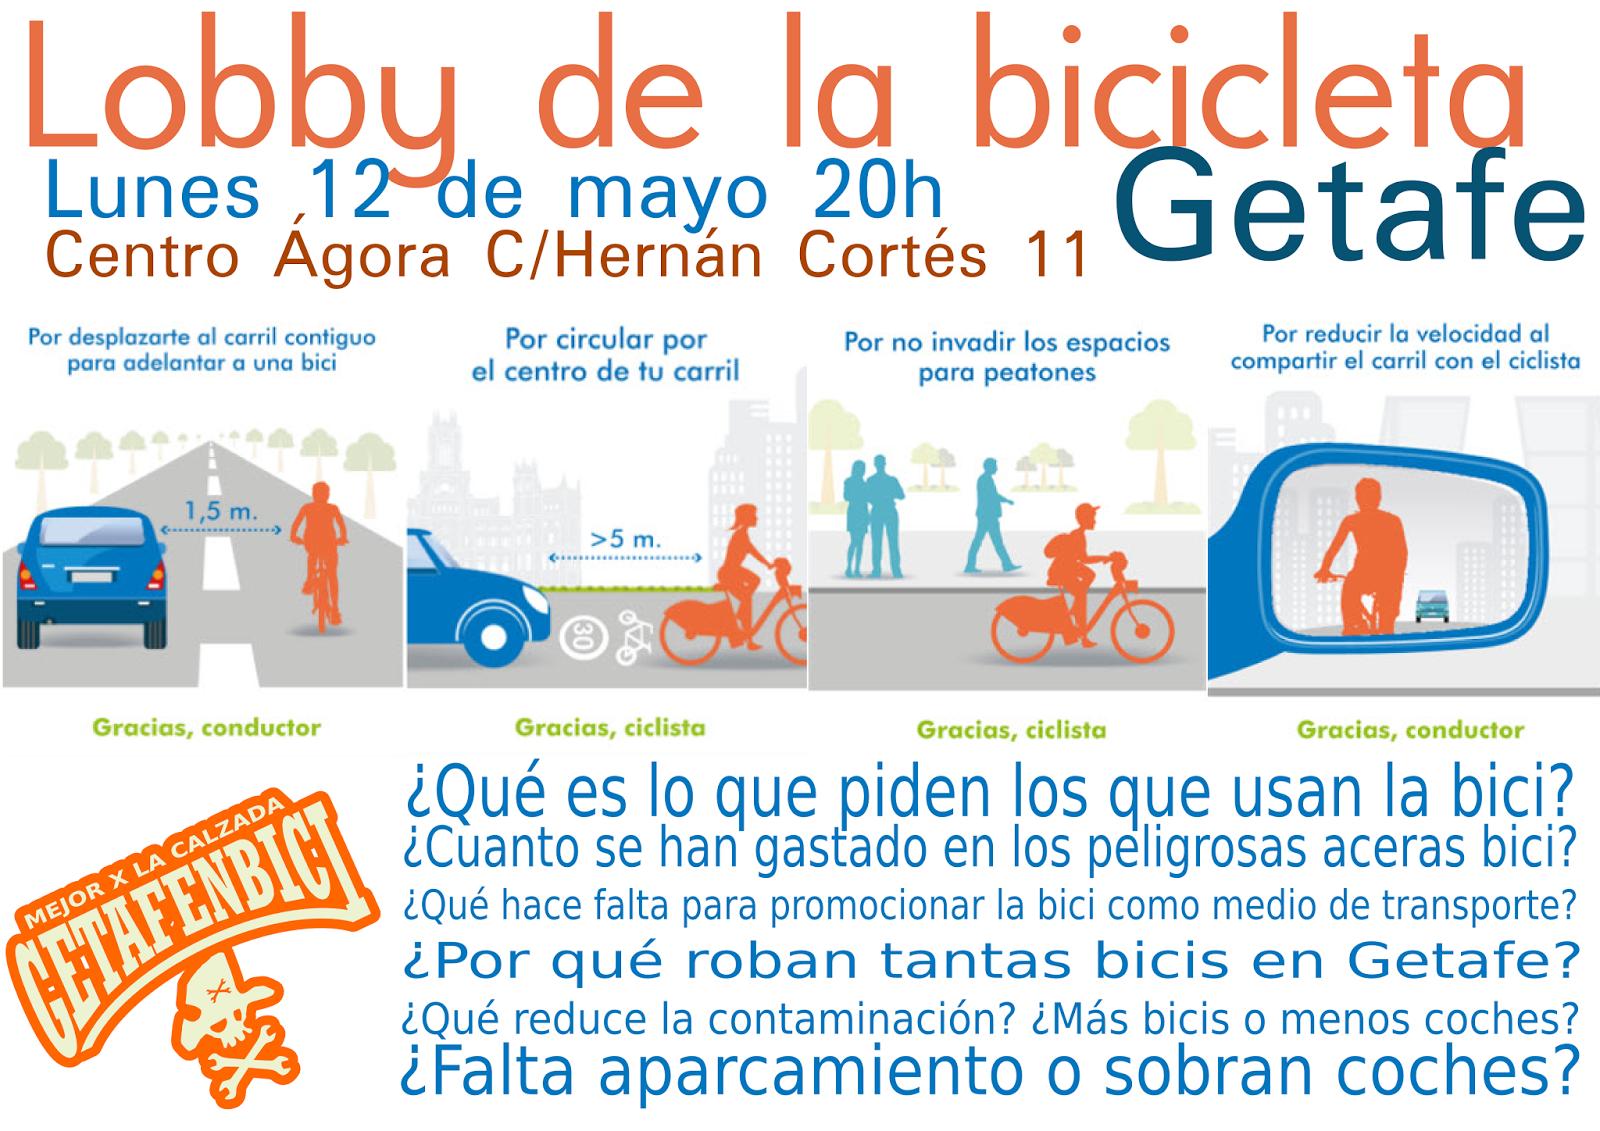 la bicicleta como medio de transporte